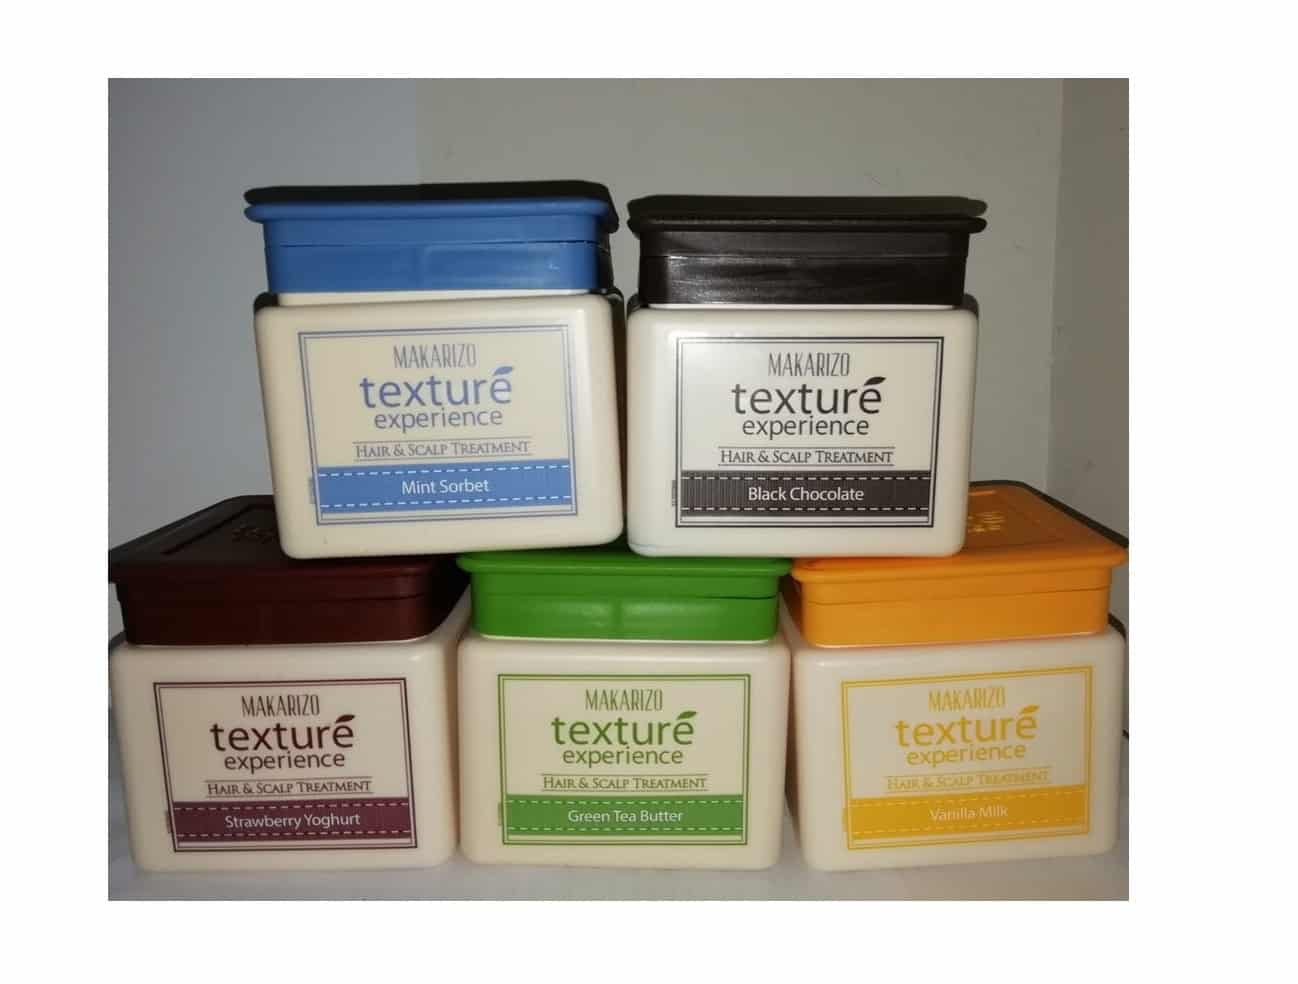 Makarizo-varian-texture-experience-greentea-butter